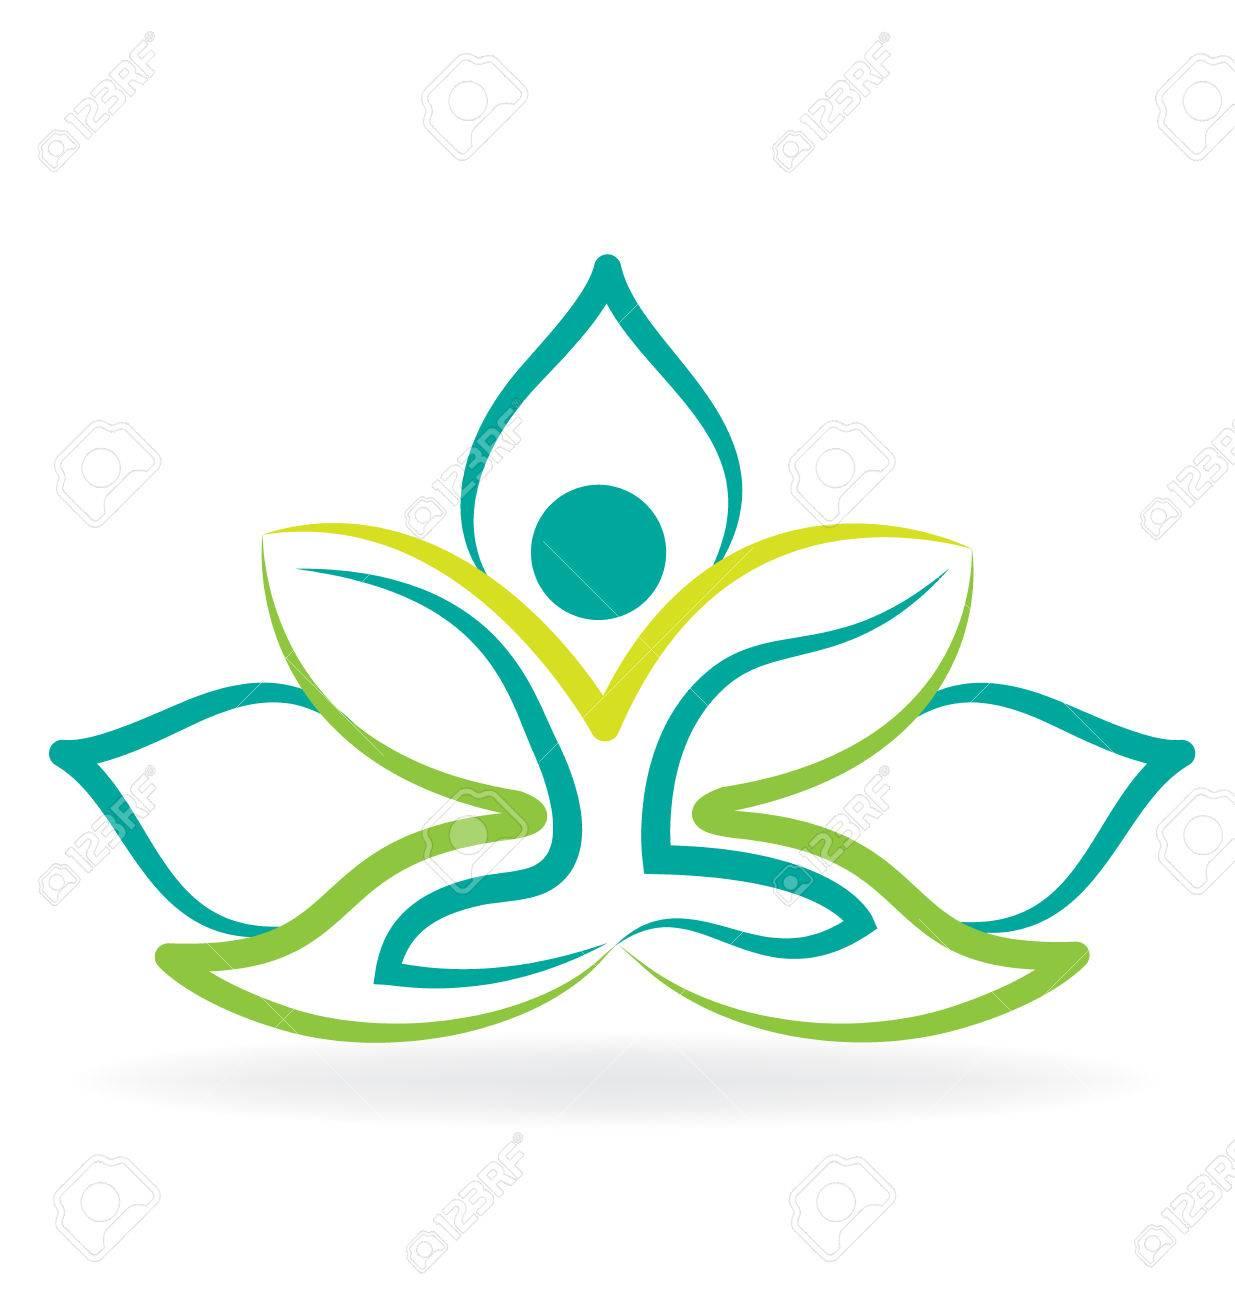 Yoga man lotus silhouette graphic vector image design - 65295733